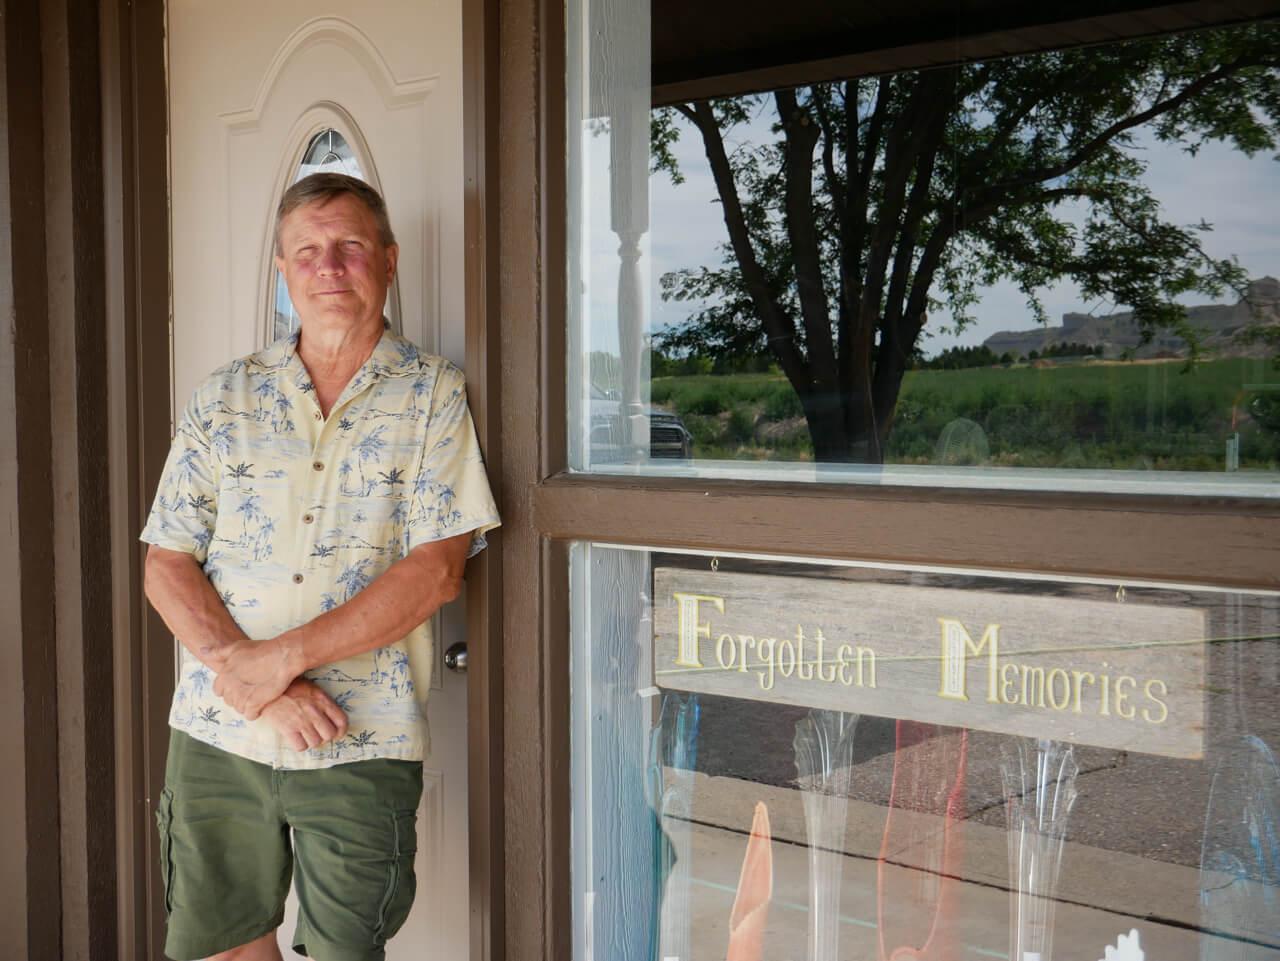 Dana Miller, Owner of Forgotten Memories Antiques